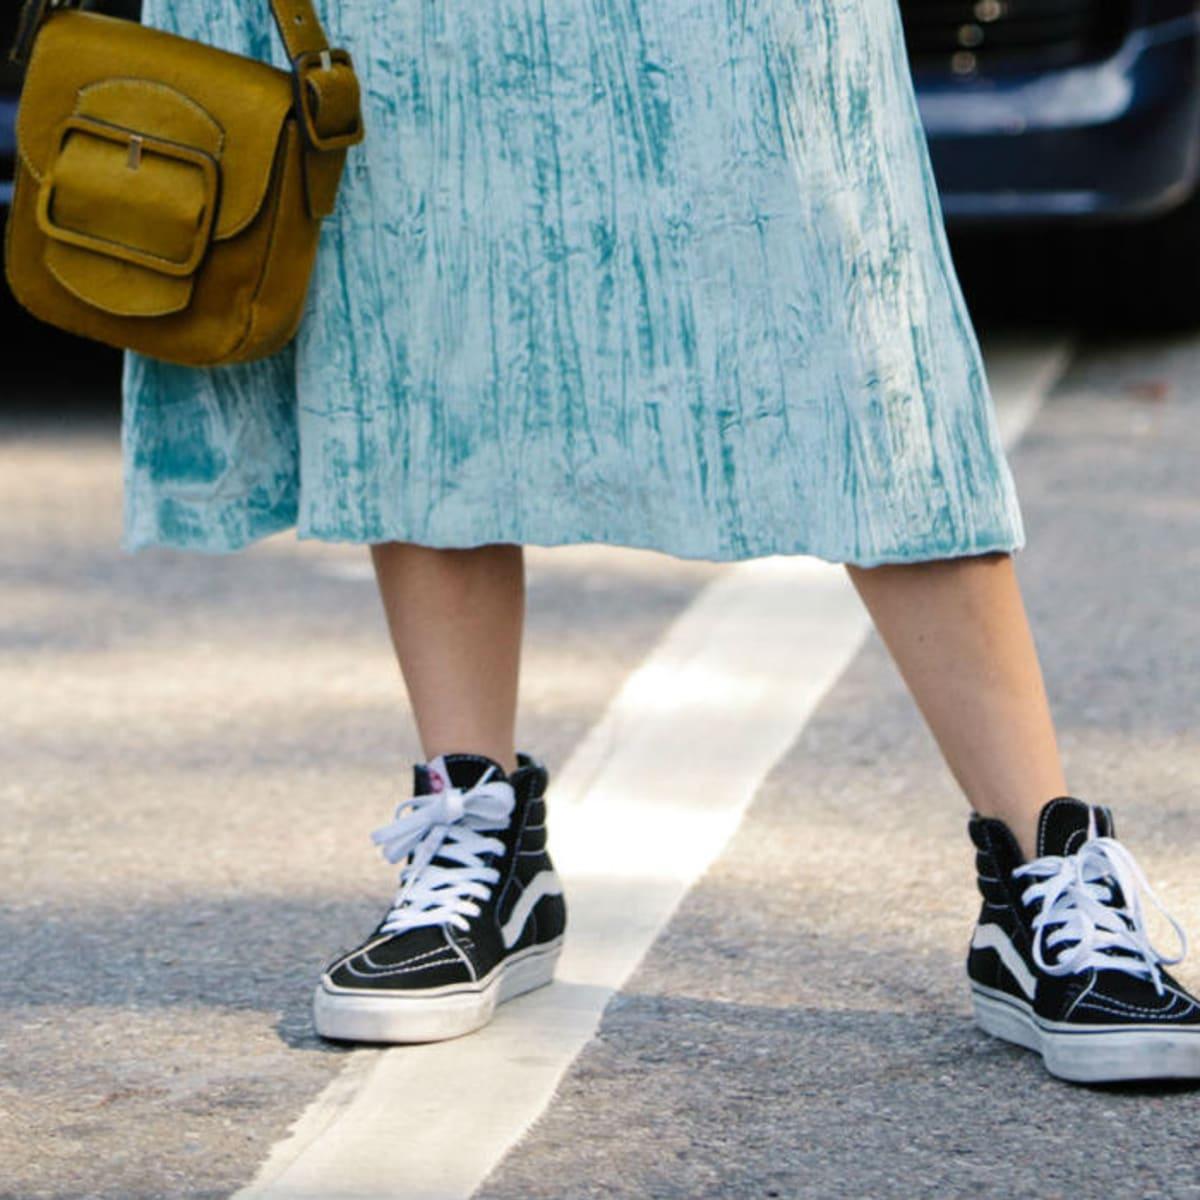 Vans Became Fashion's Latest Shoe Trend